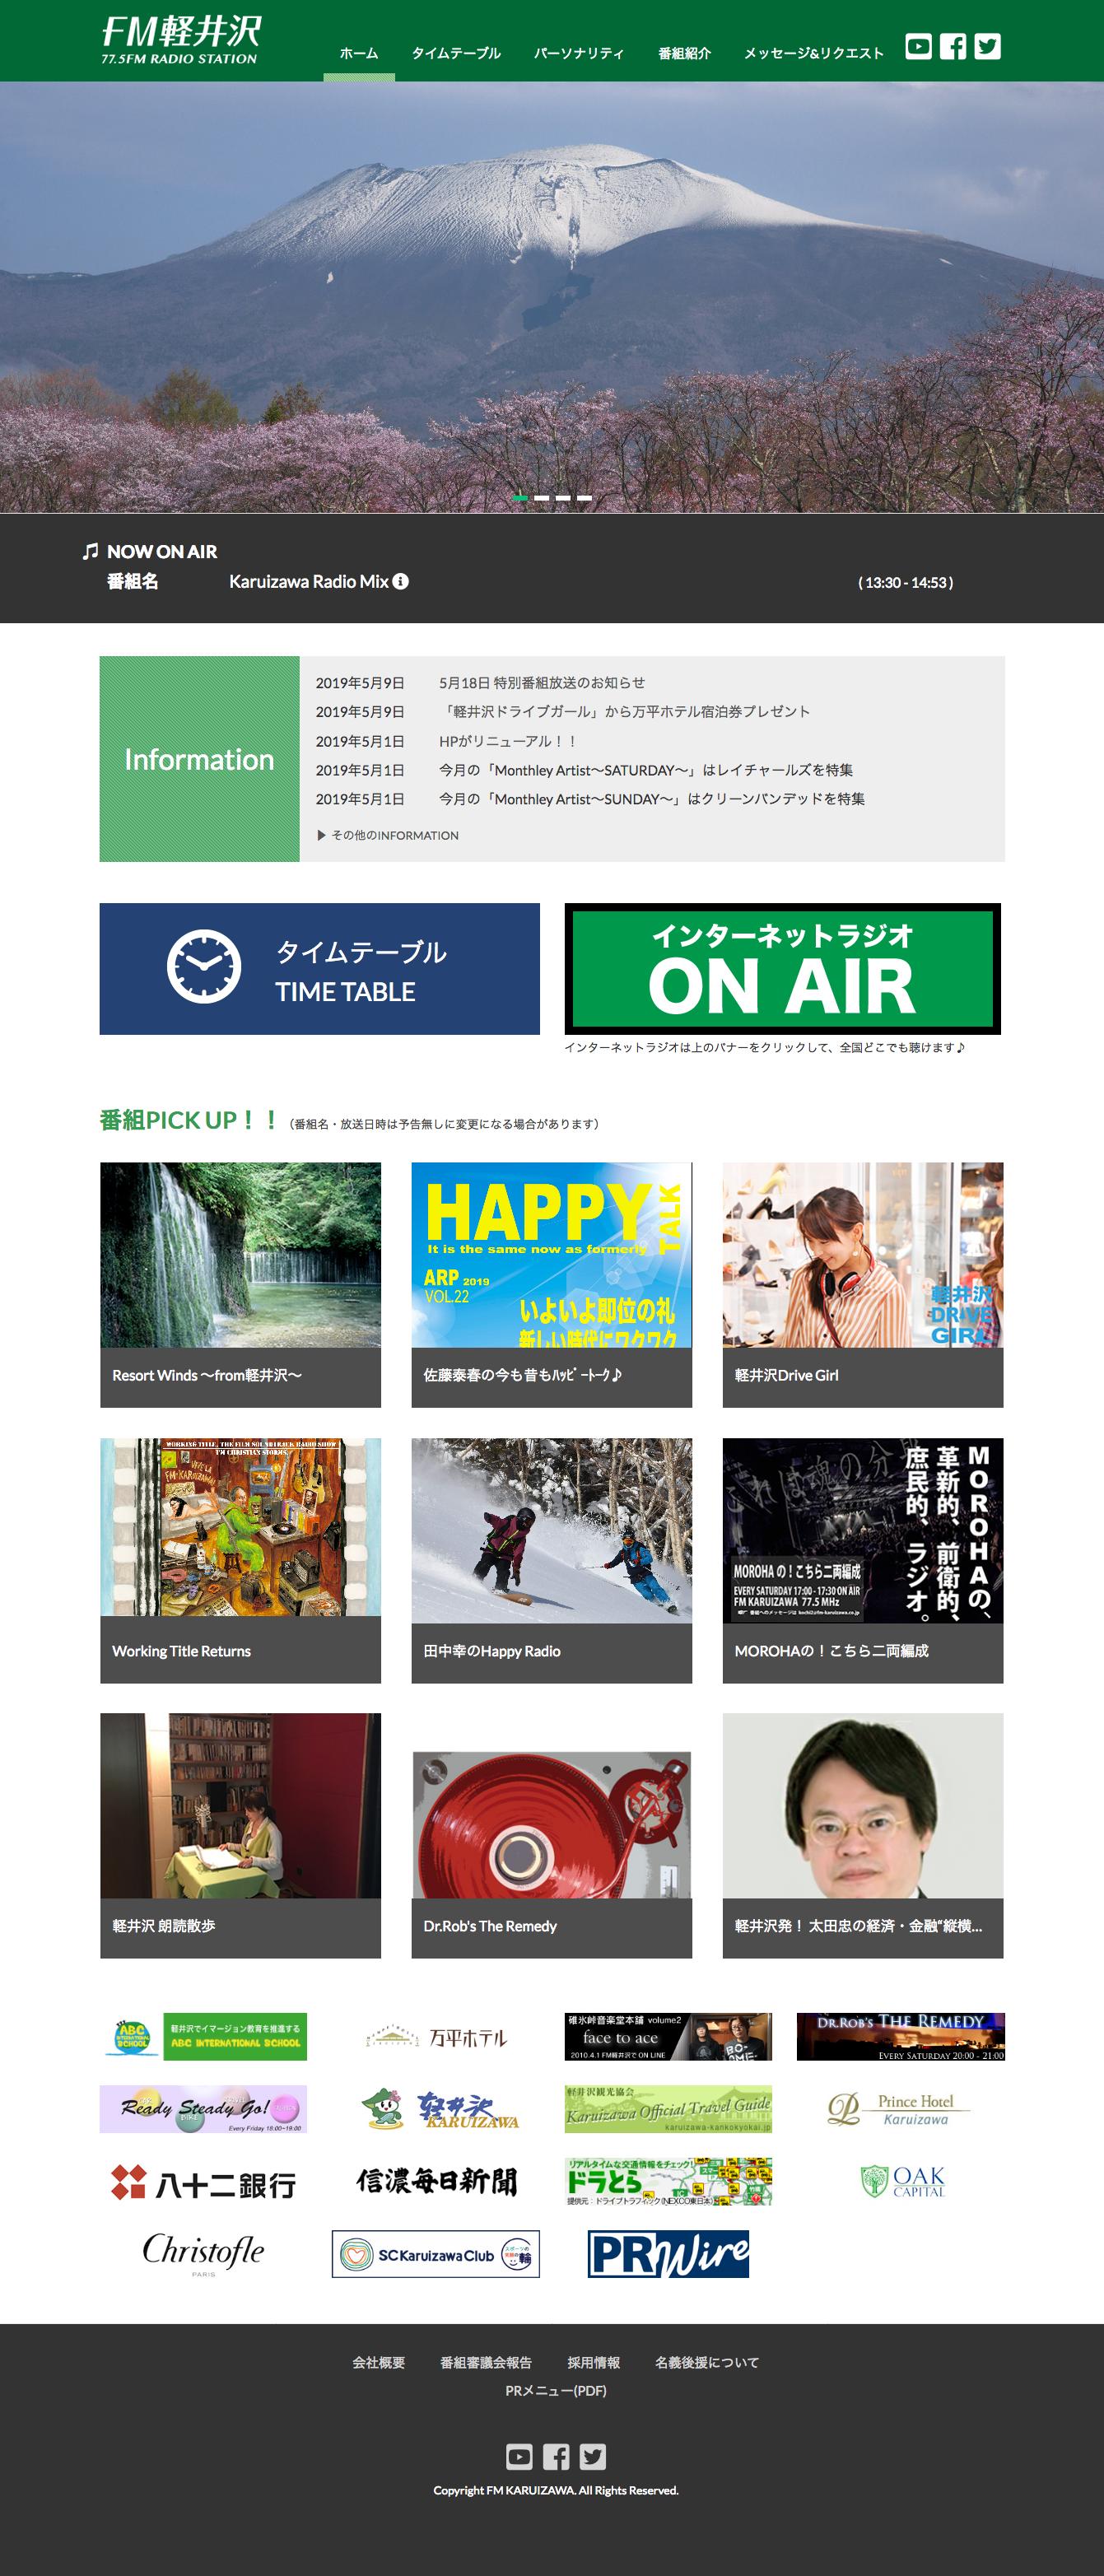 FM軽井沢